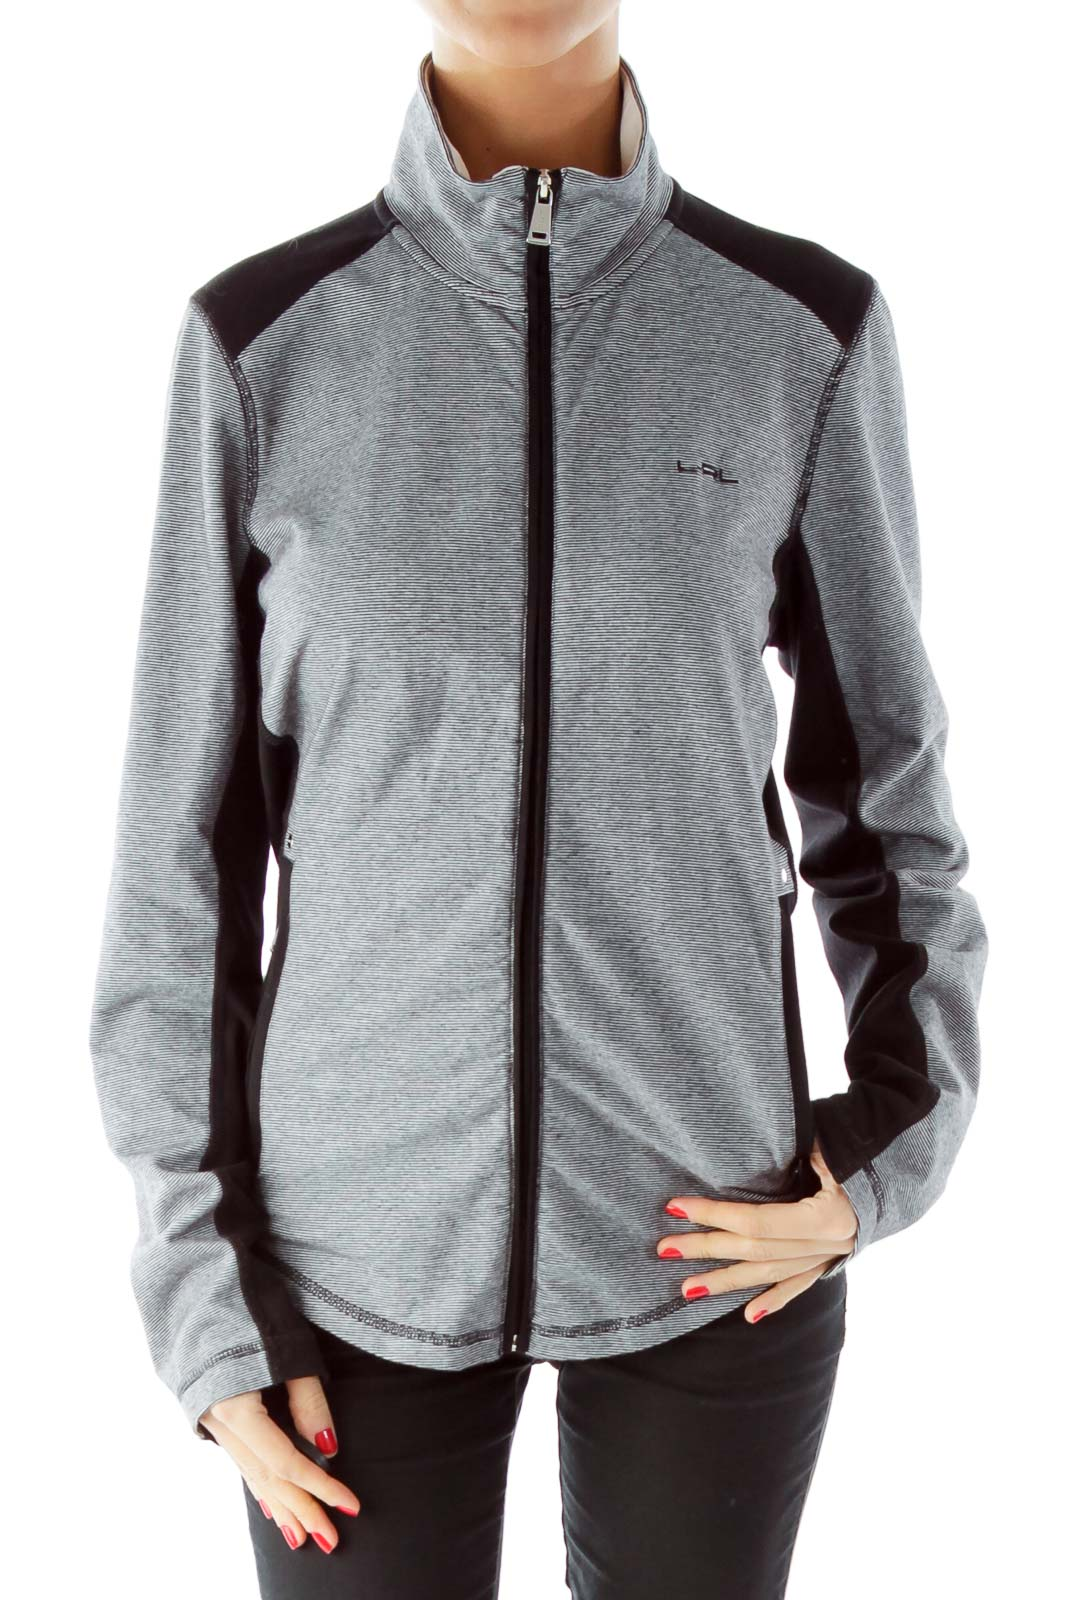 Black White Pinstripe Sports Jacket Front